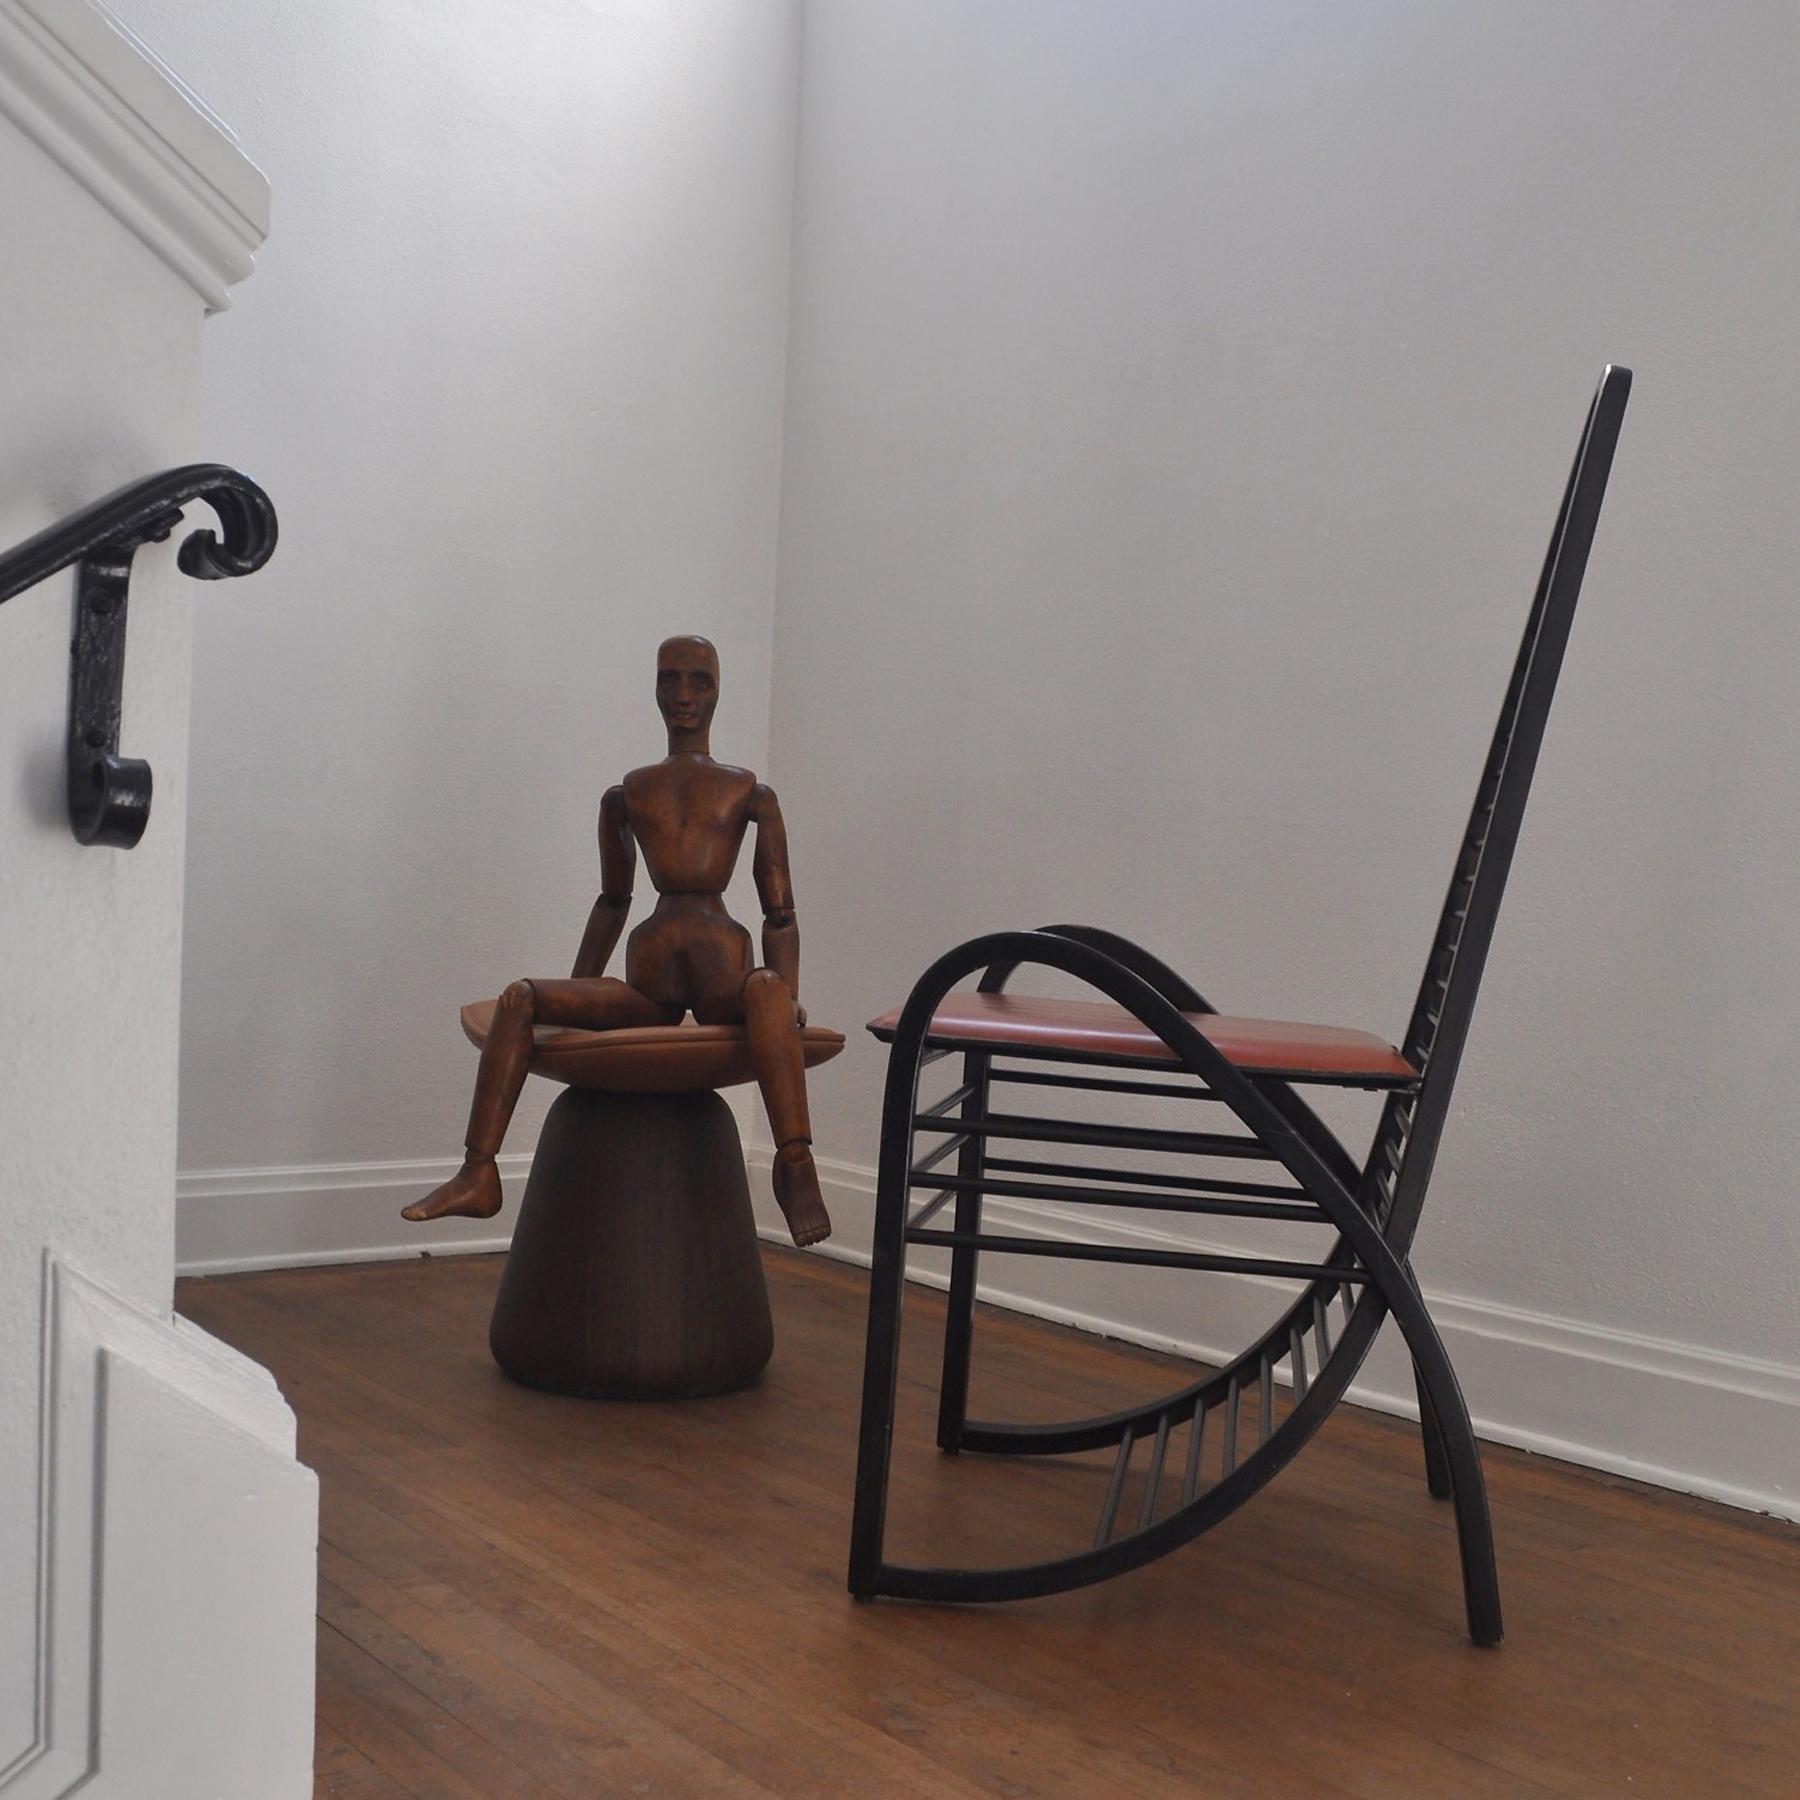 siglo-moderno-brand-history-sculpting-53.jpg